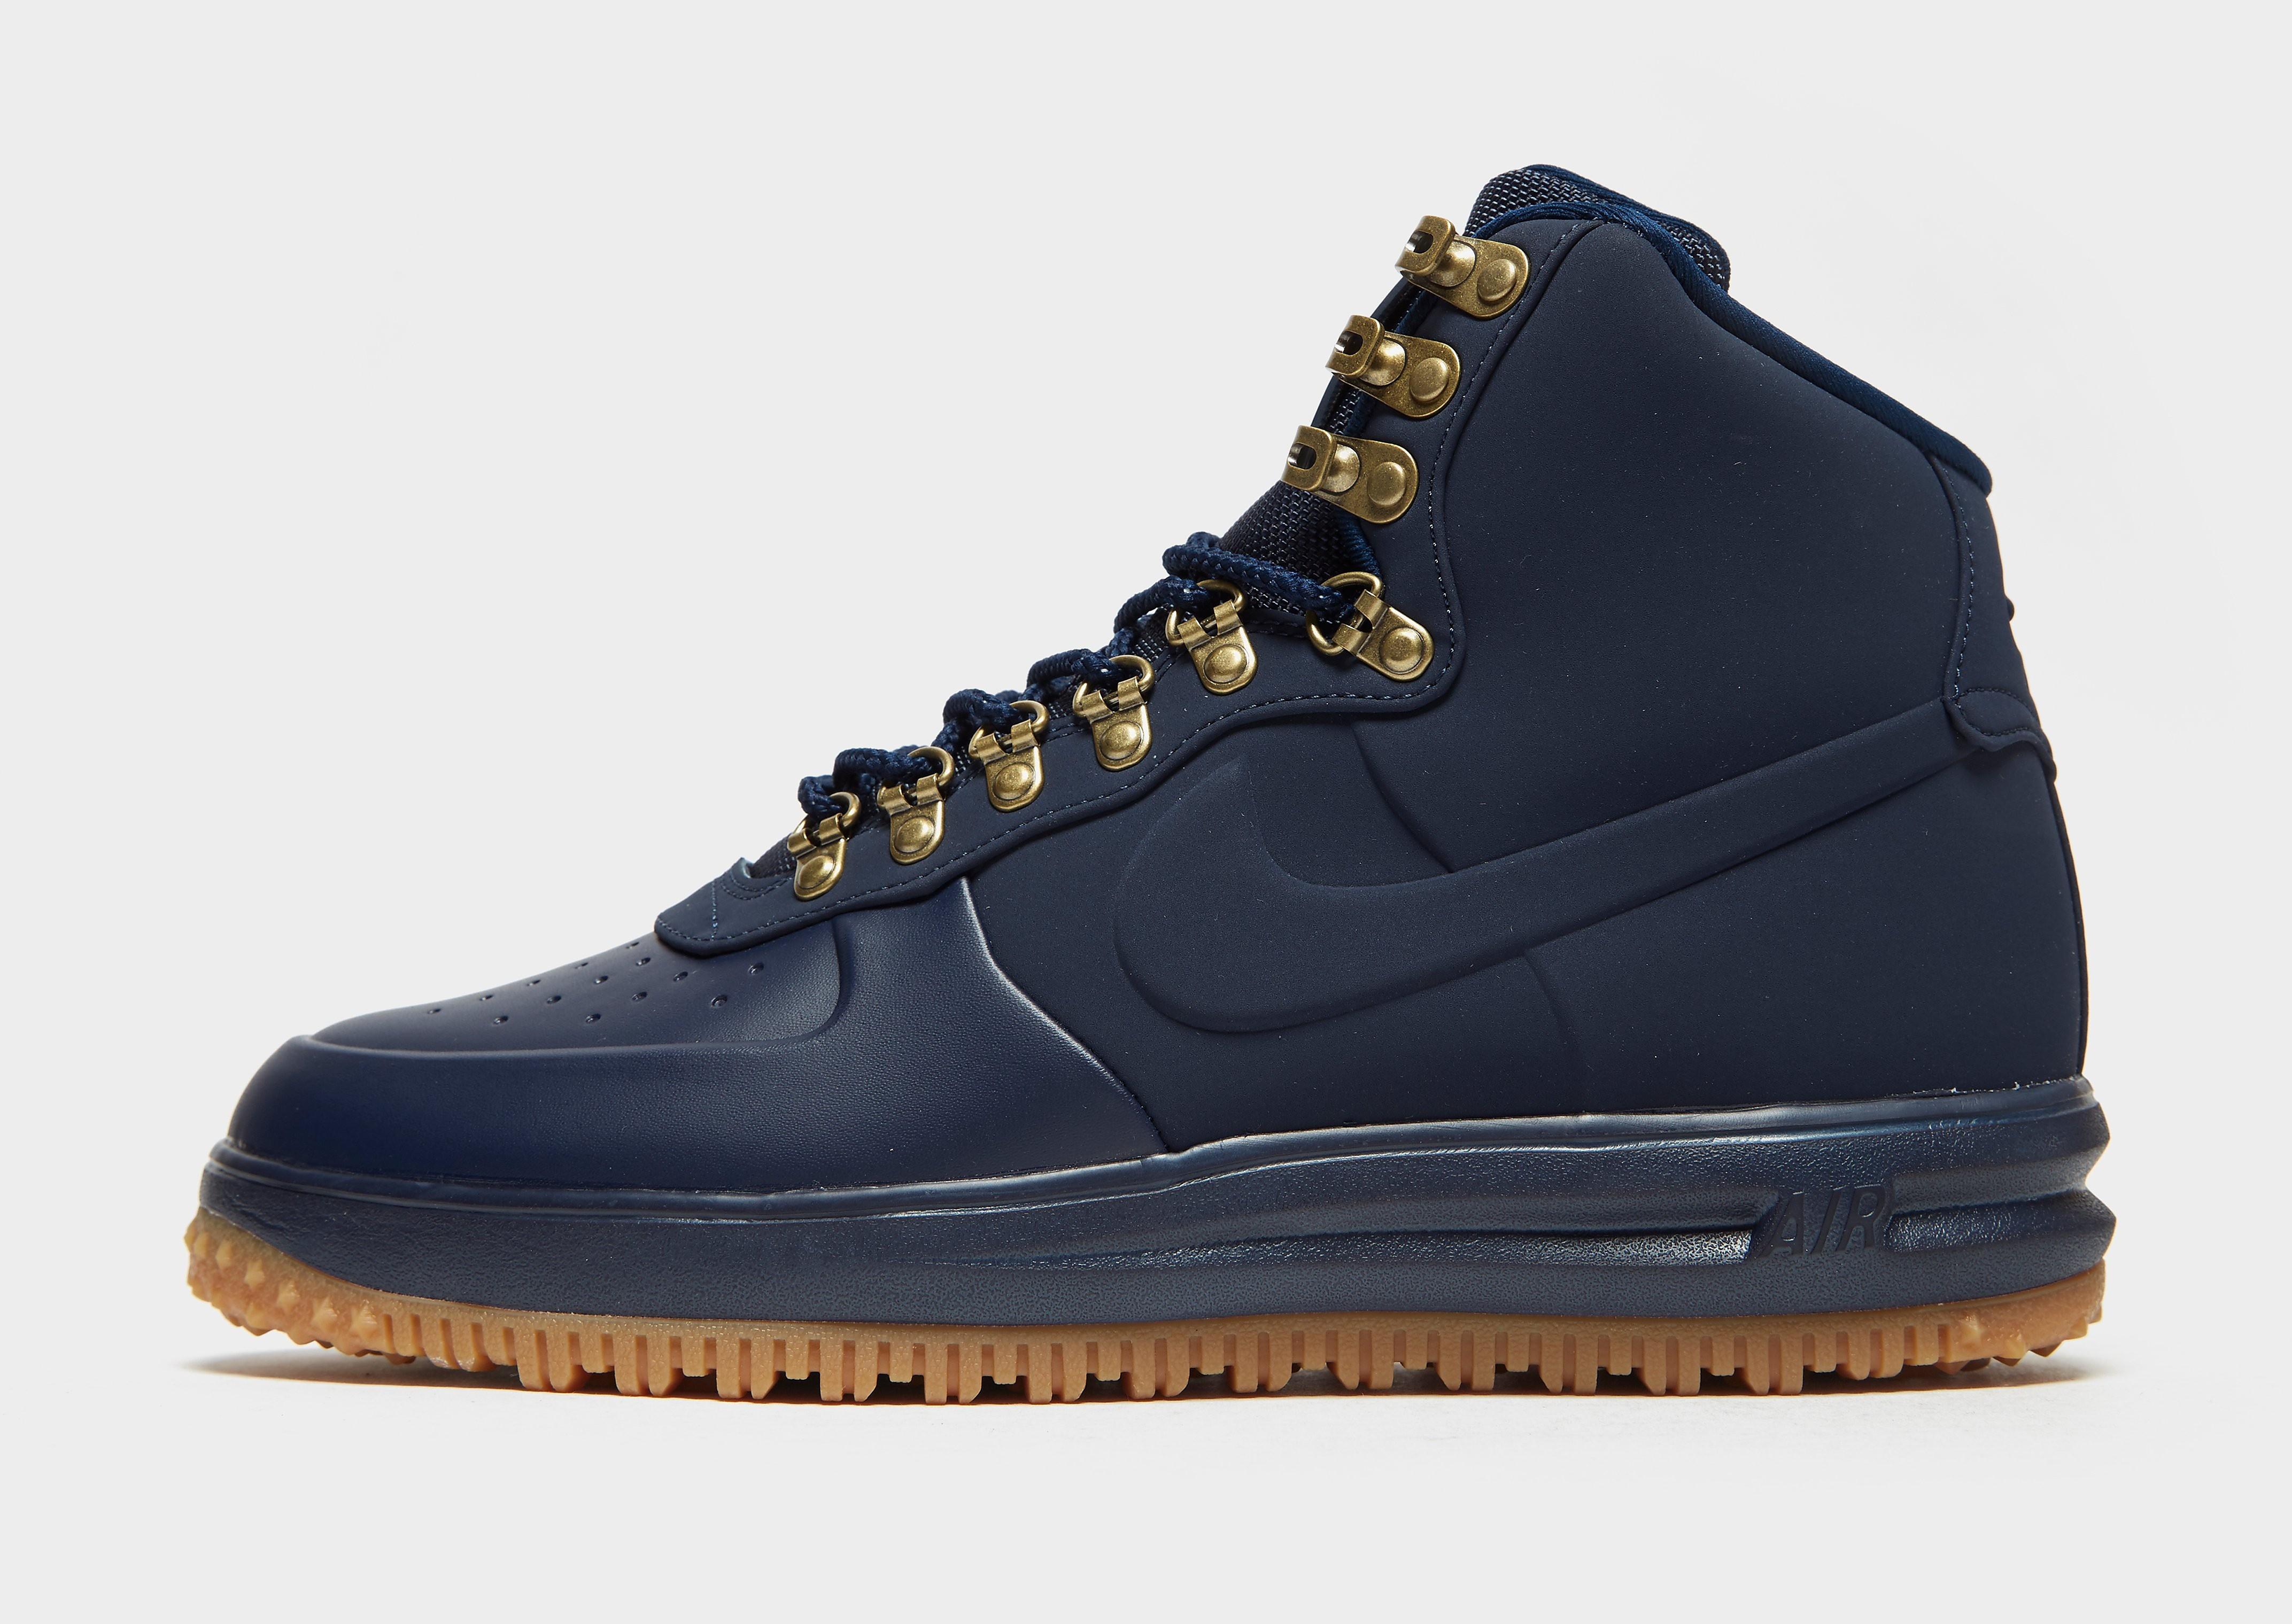 Nike Air Force 1 Mid Duck Boot - Blauw - Heren